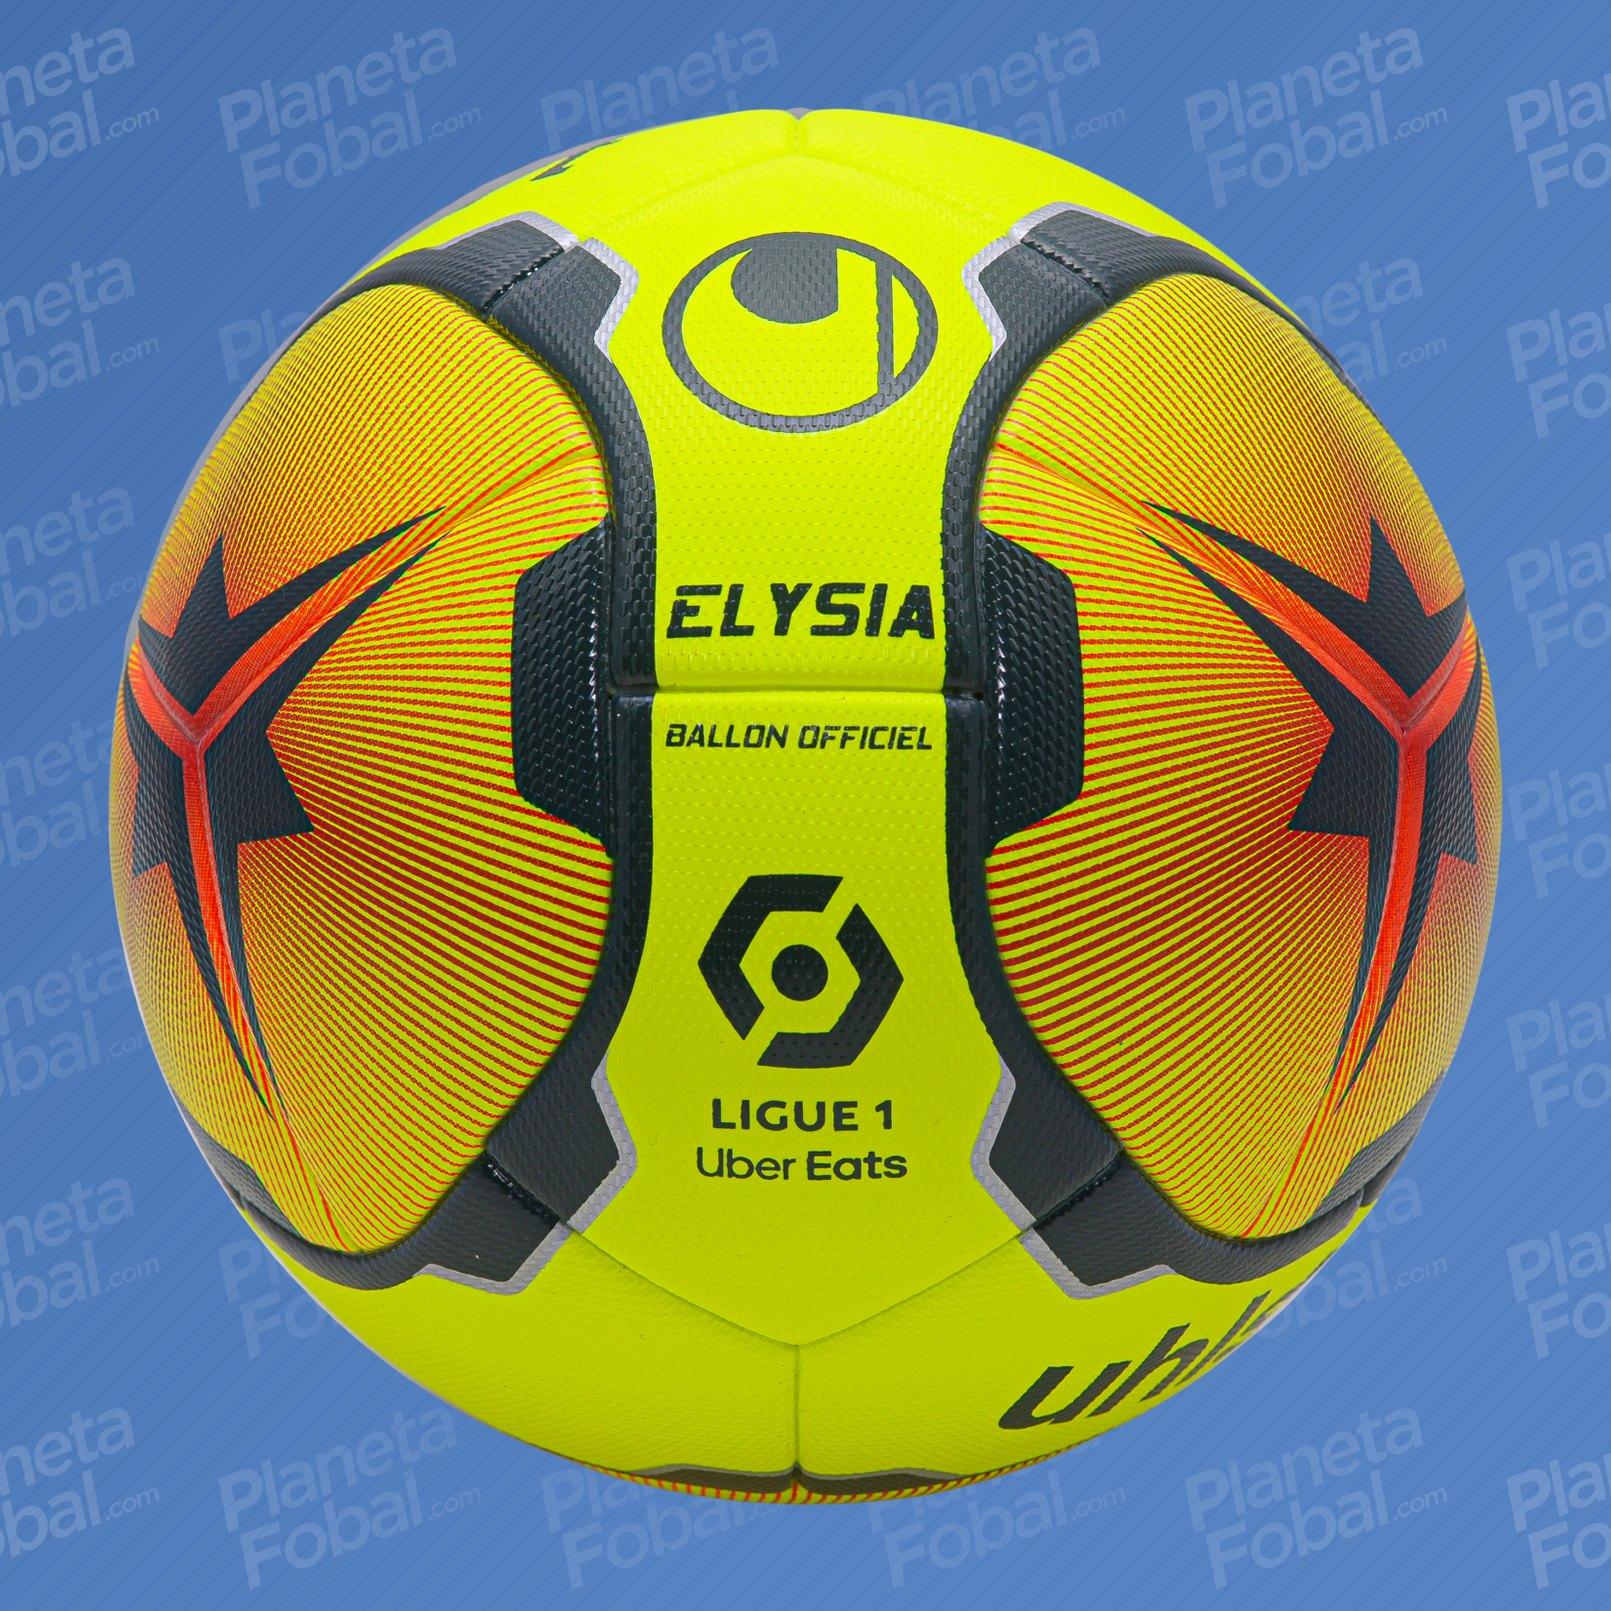 Balón Uhlsport «Elysia» Ligue 1 2020/21 | Imagen LFP